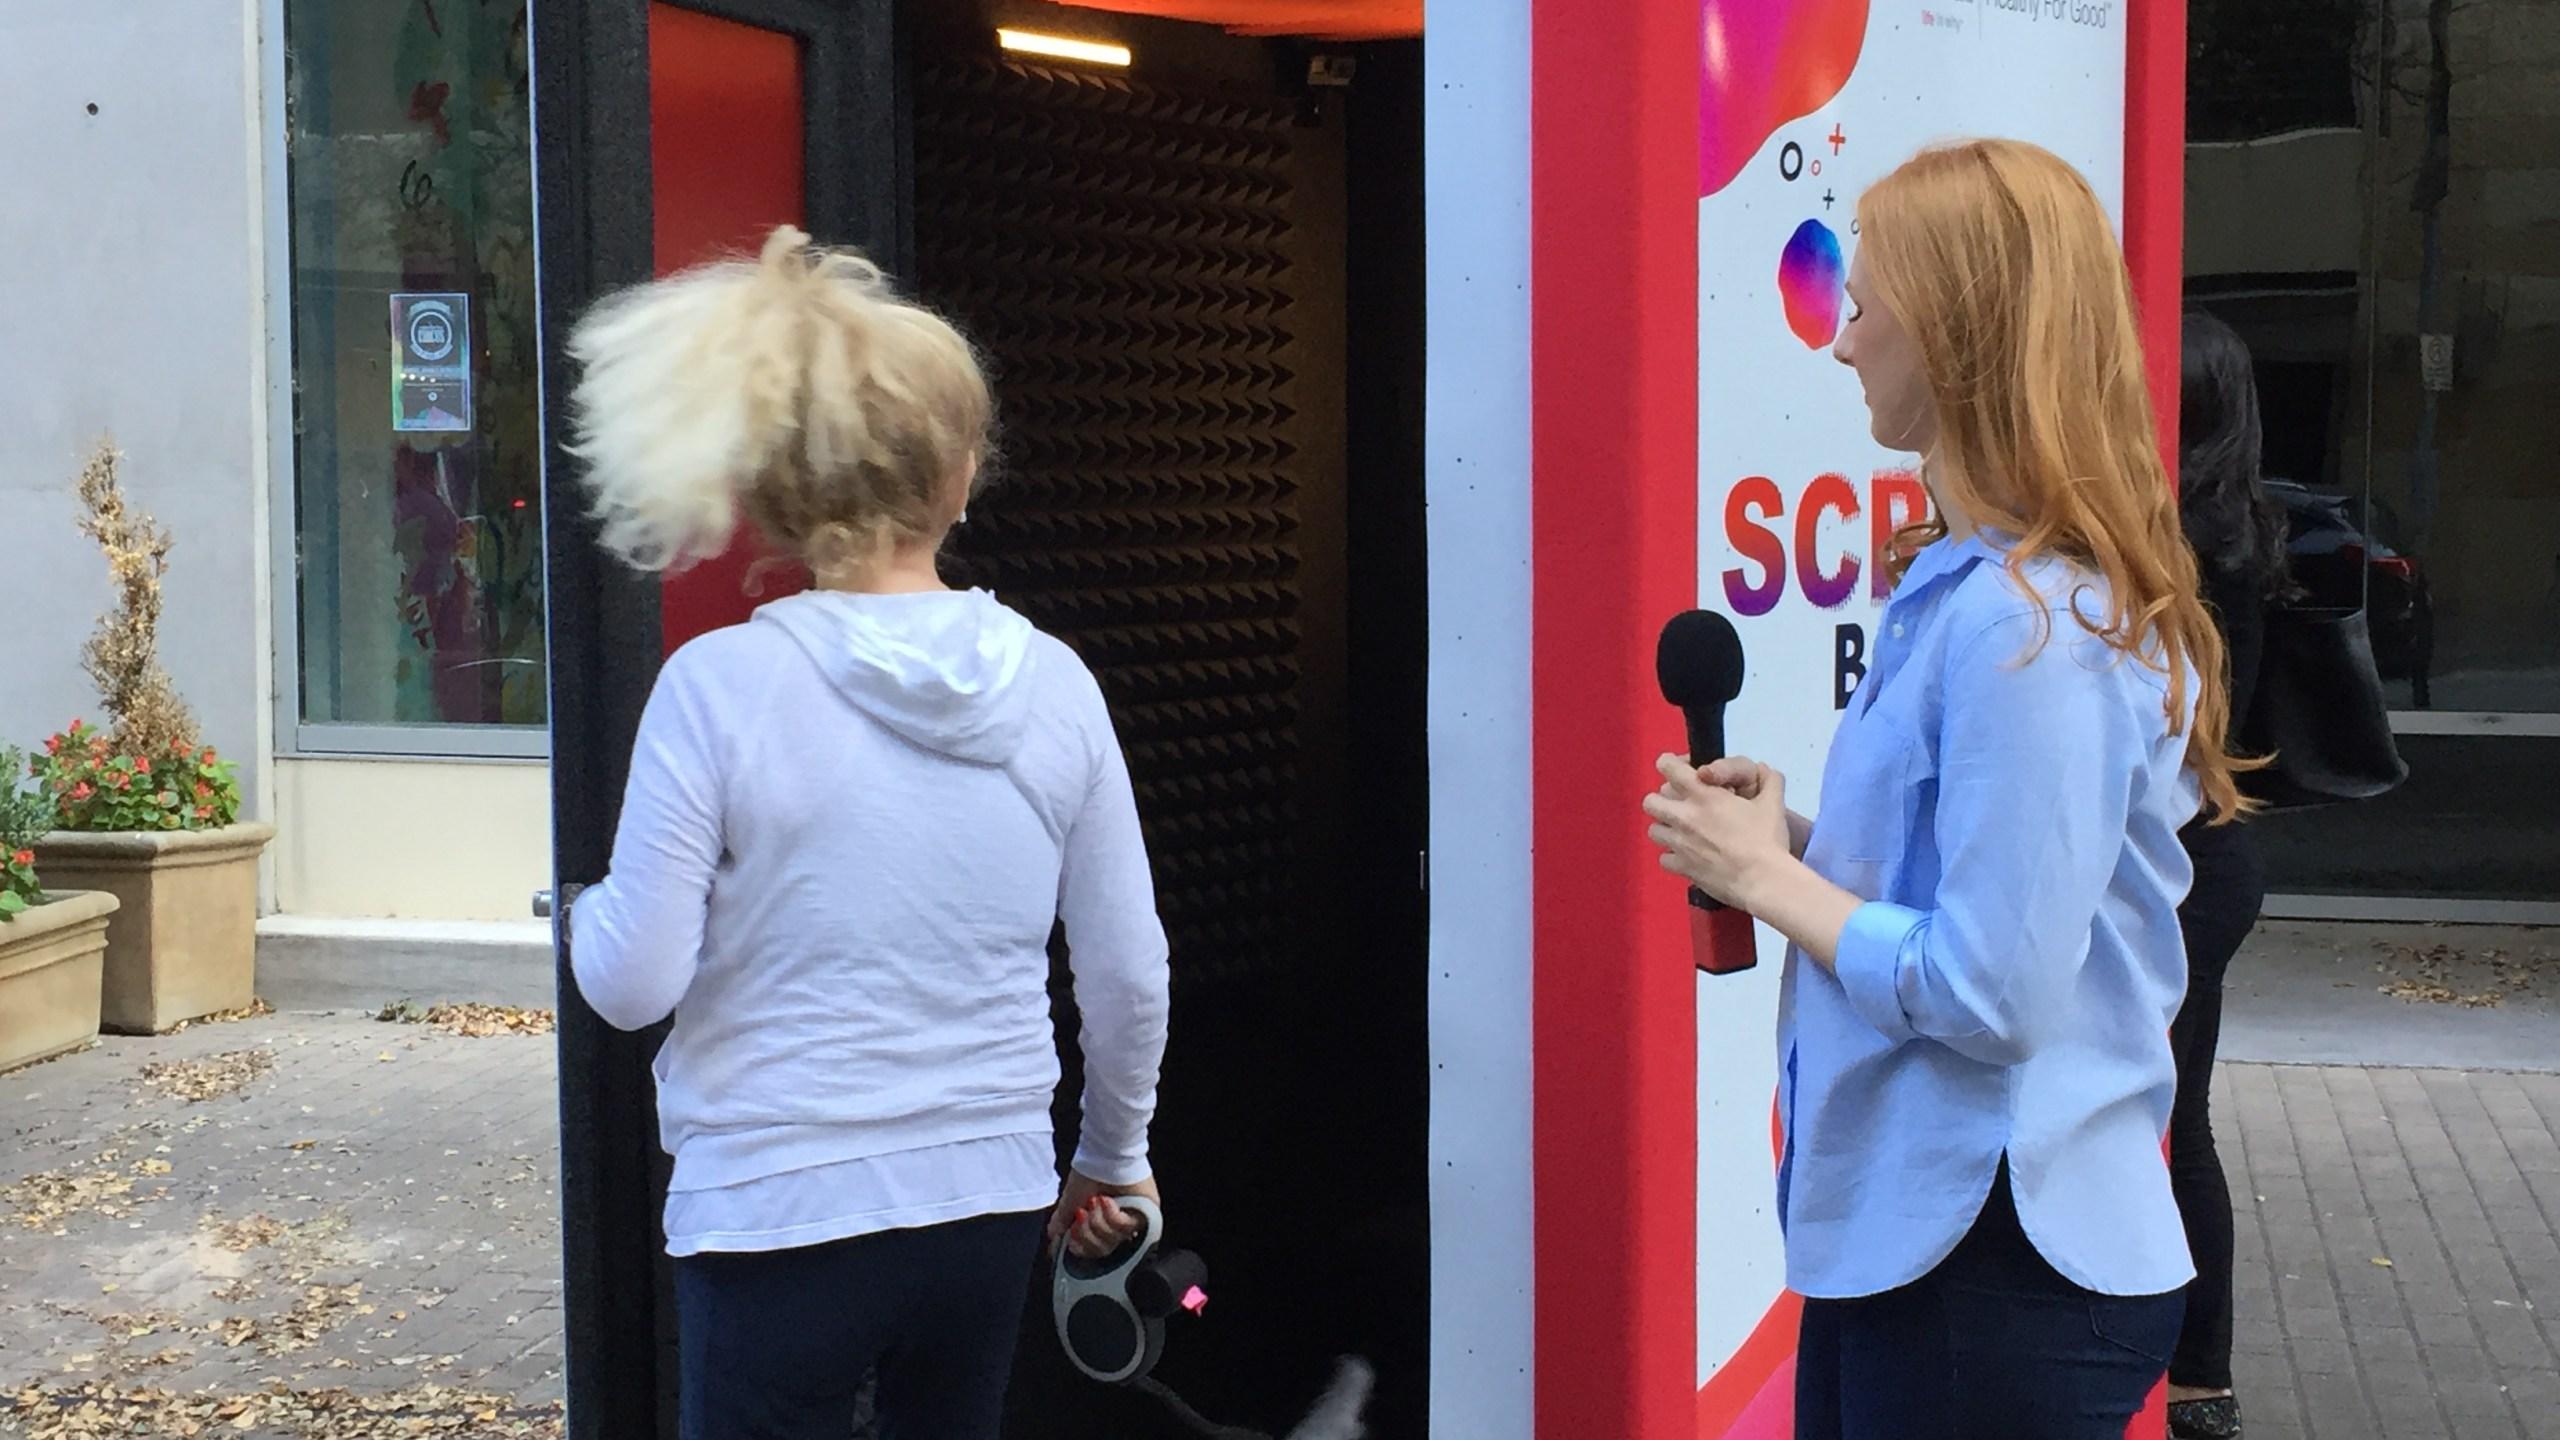 scream booth_560361